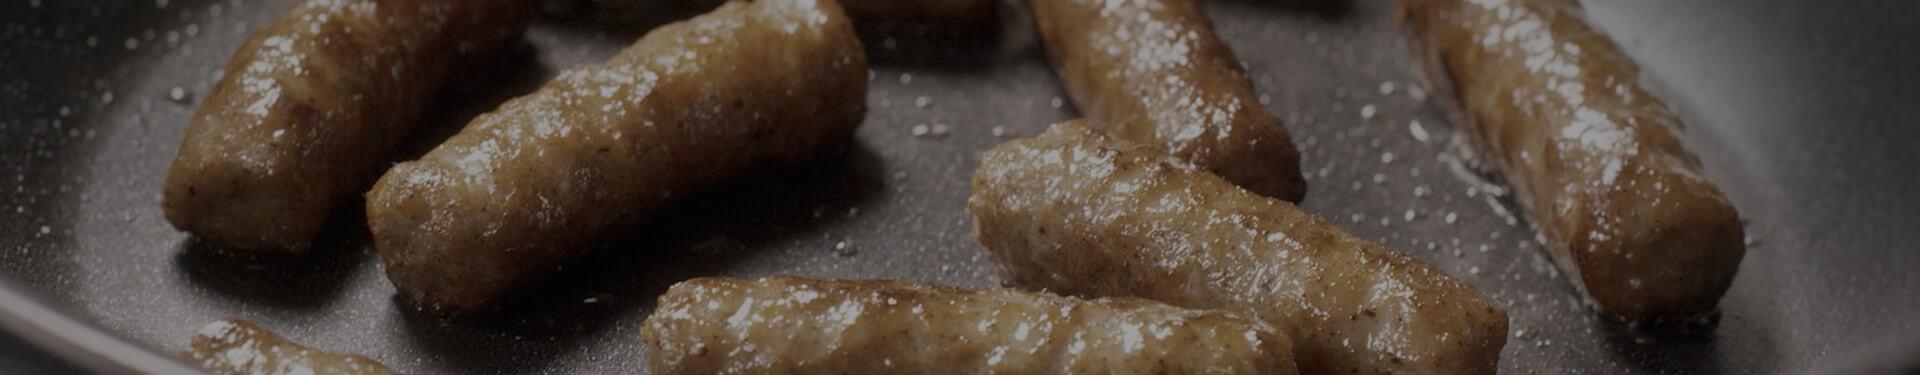 Jones Breakfast Sausage Links Cooking In a Skillet